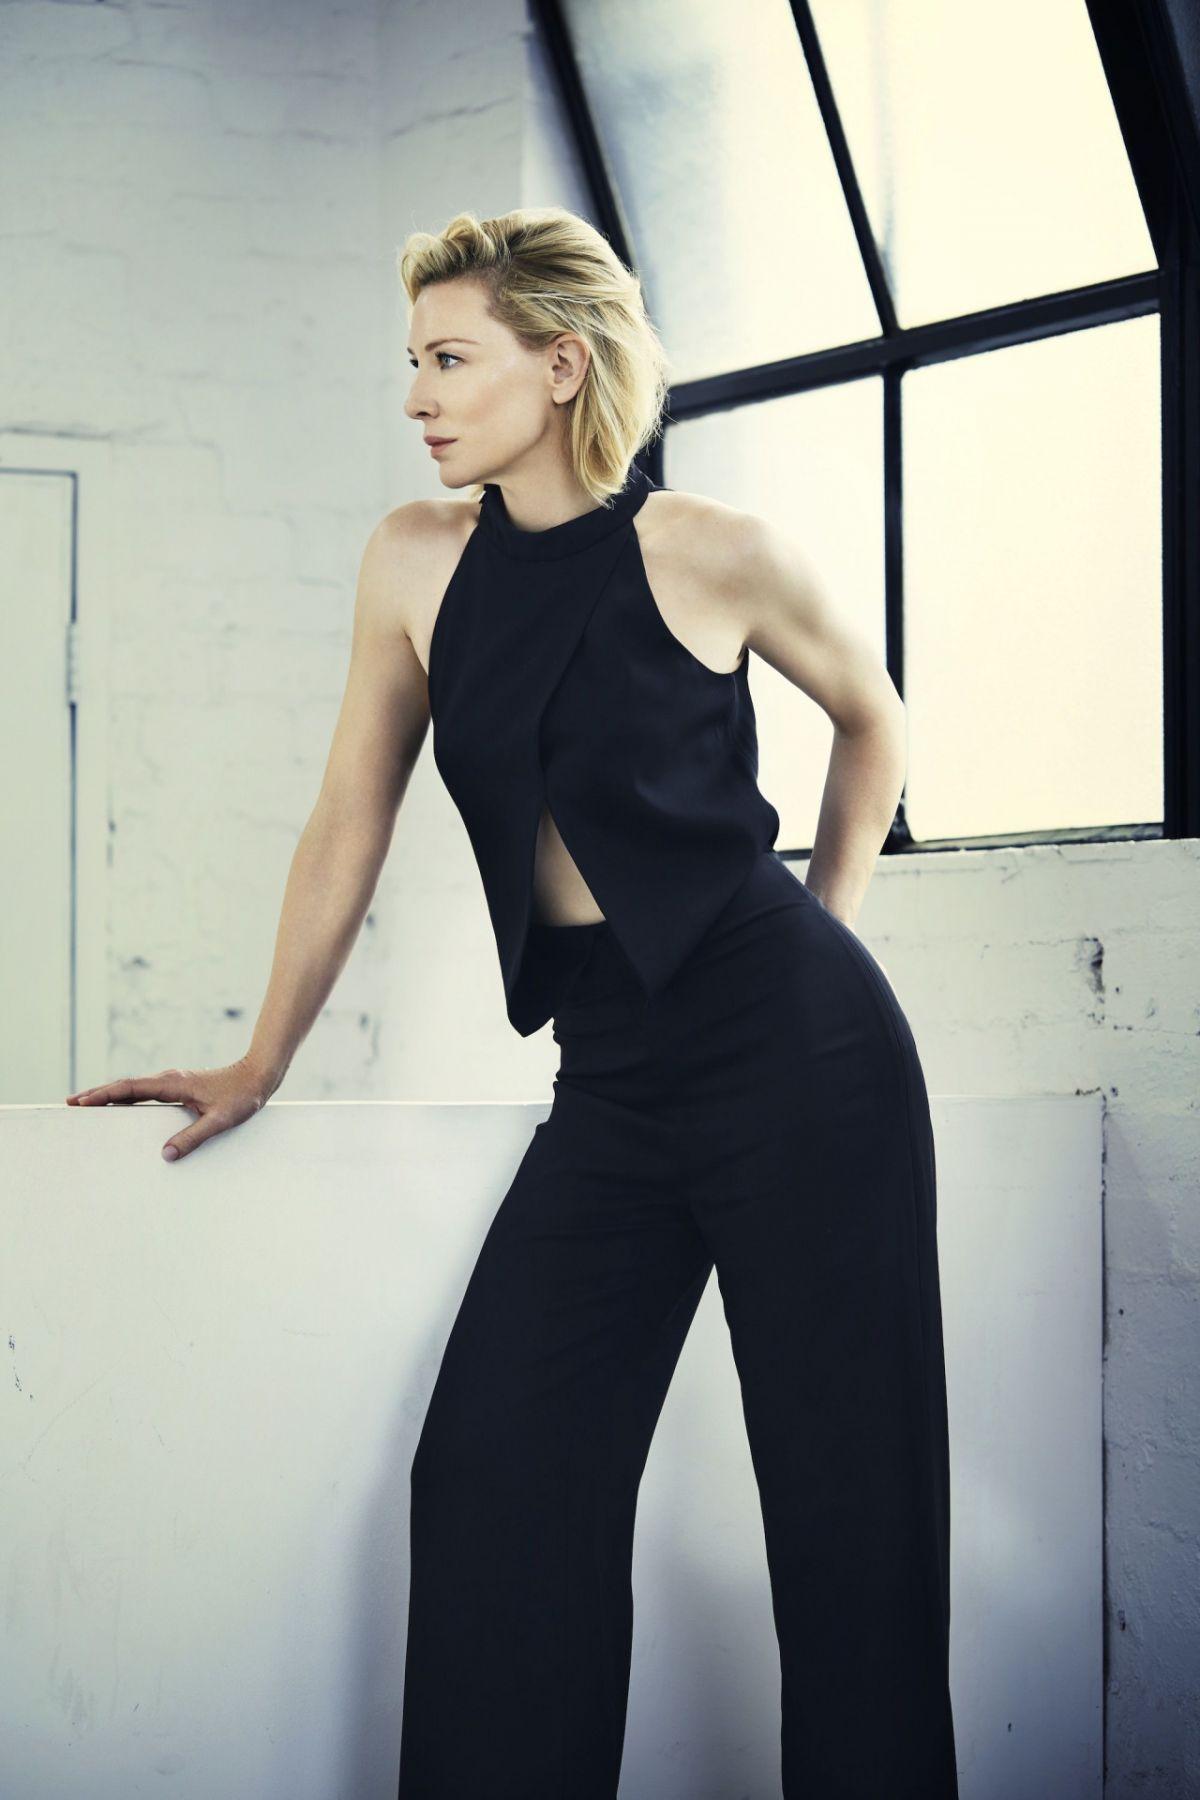 CATE BLANCHETT in Rhapsody Magazine, December 2016 Issue ... Cate Blanchett 2016